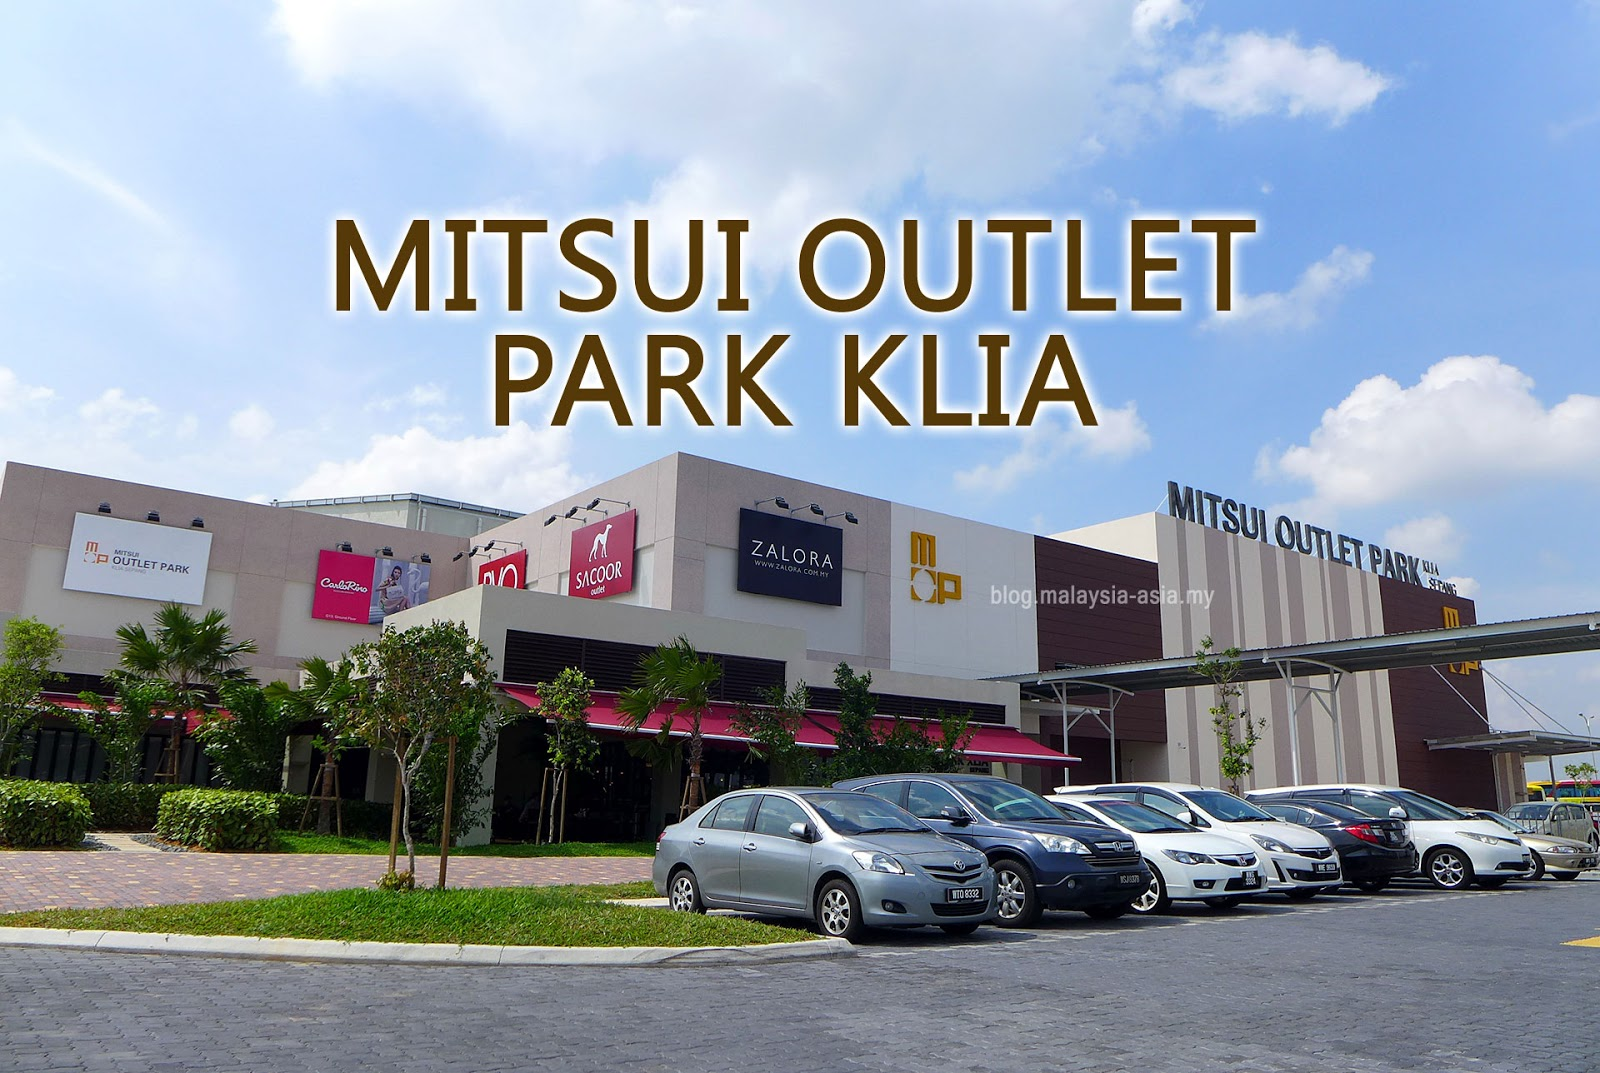 Mitsui Outlet Park KLIA Video - Malaysia Asia Travel Blog c08d47e422f